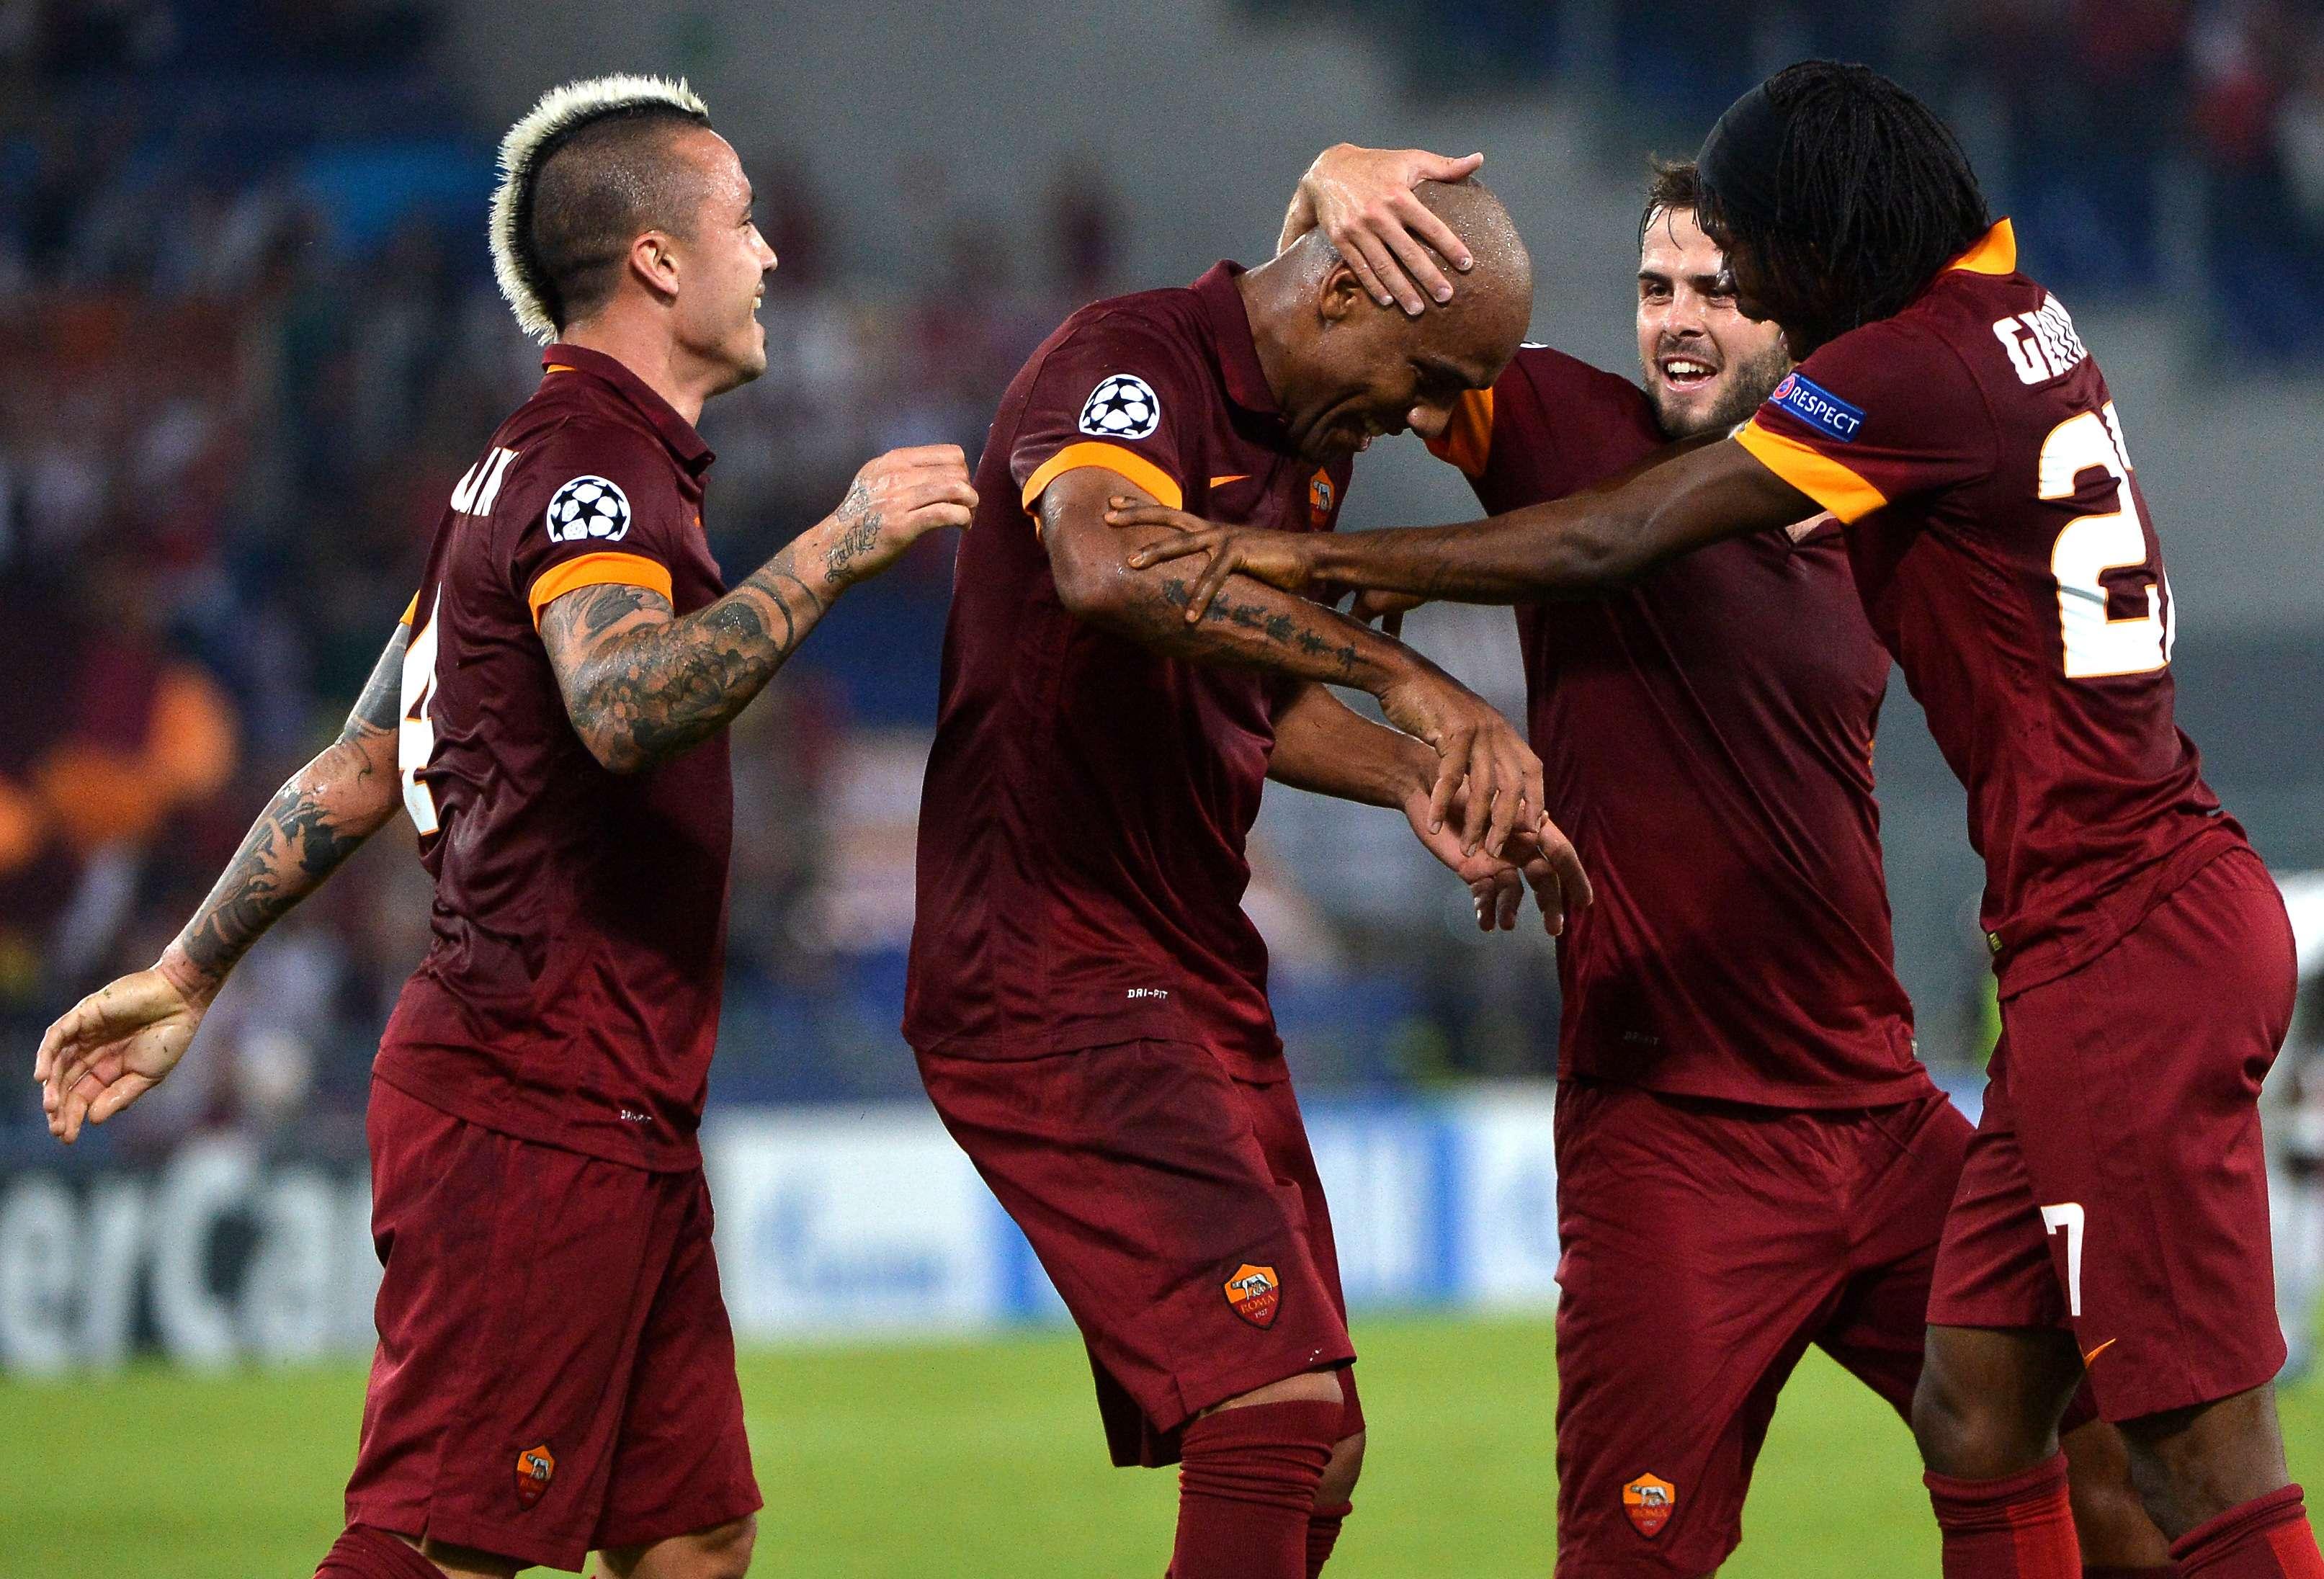 Equipe da Roma festeja goleada sobre o CSKA Foto: Alberto Pizzoli/AFP